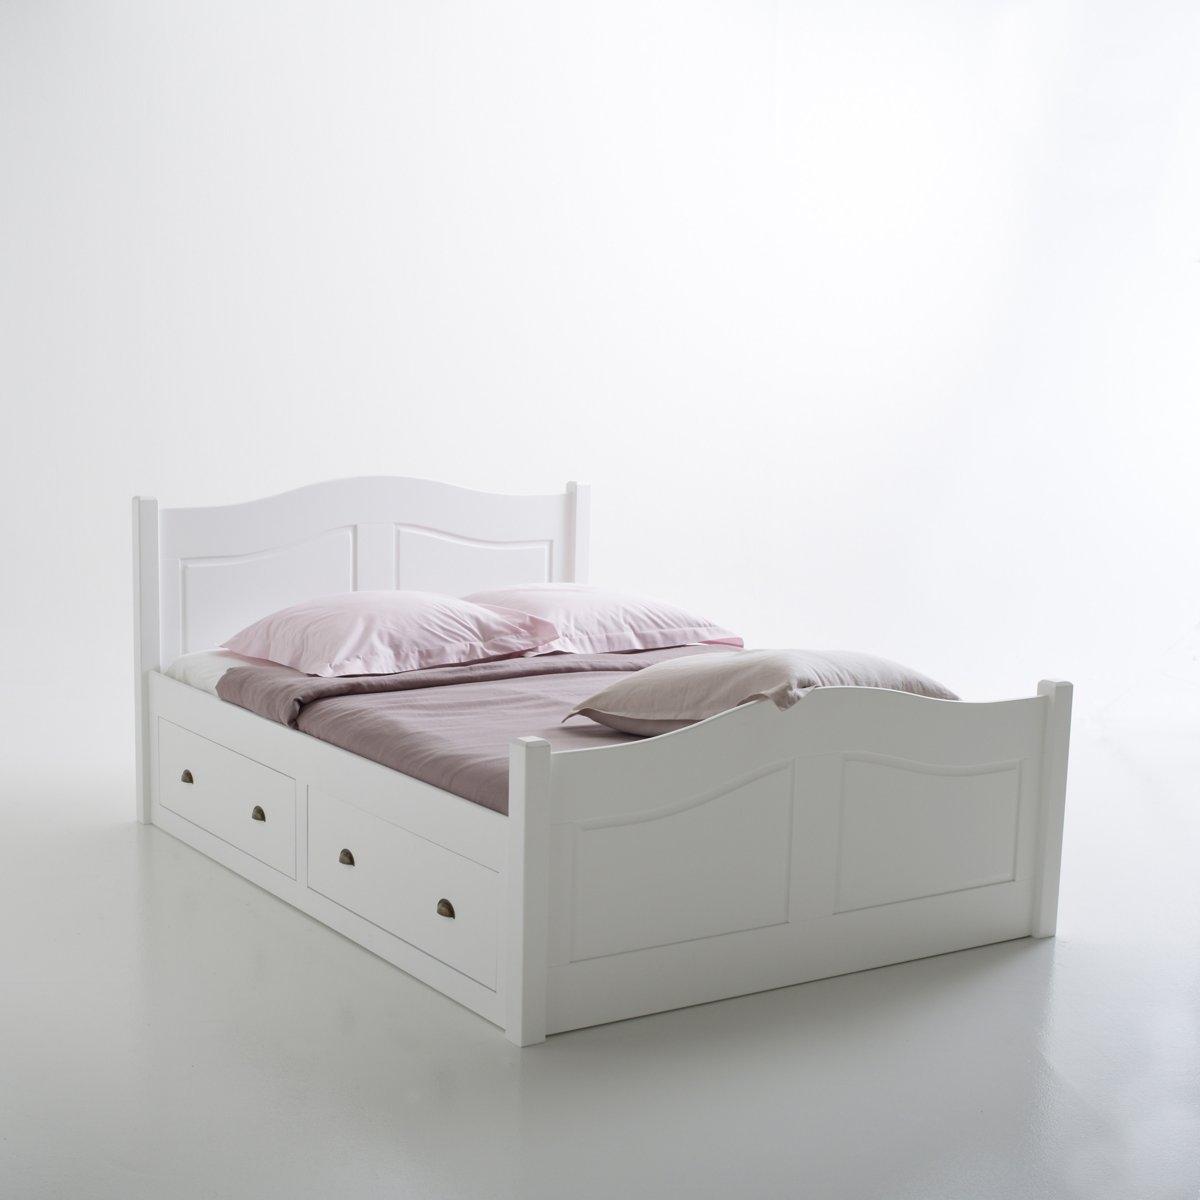 "Doppelbett ""Authentic Style"", 4 Schubladen"